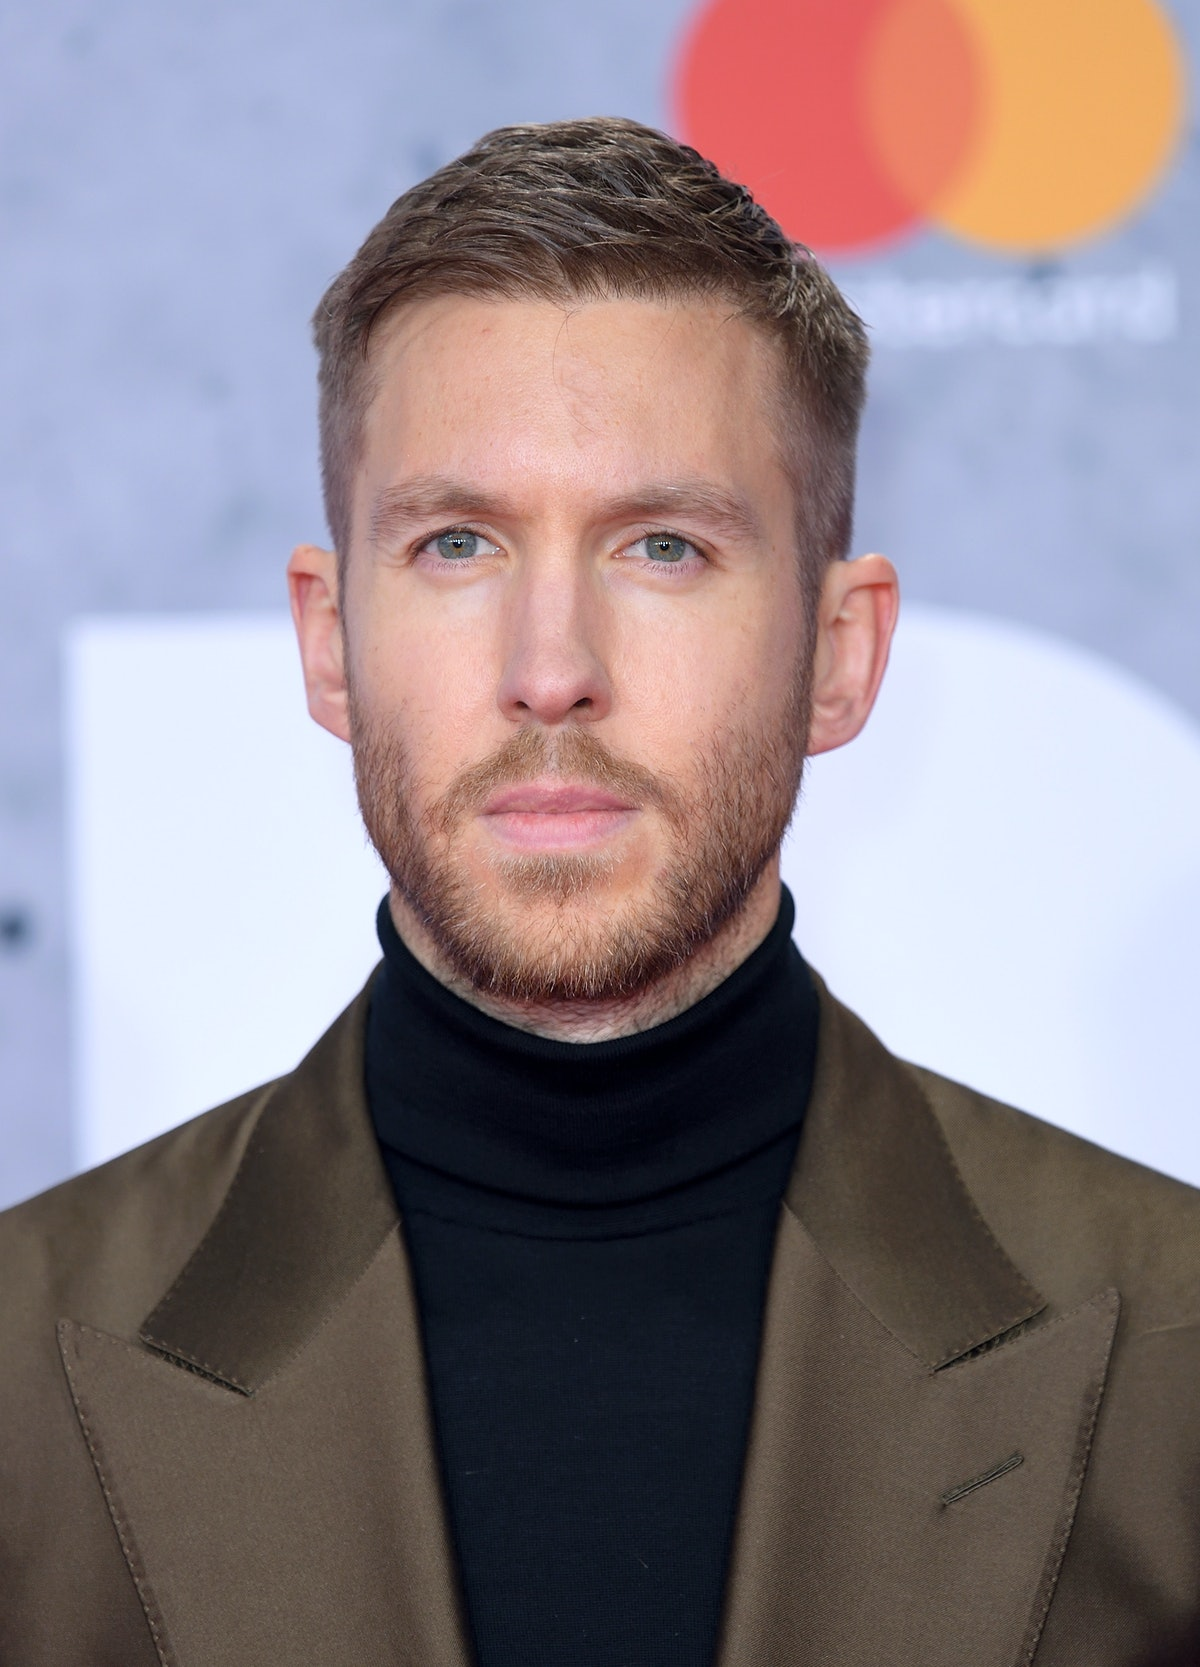 Calvin Harris attends the Brit Awards.